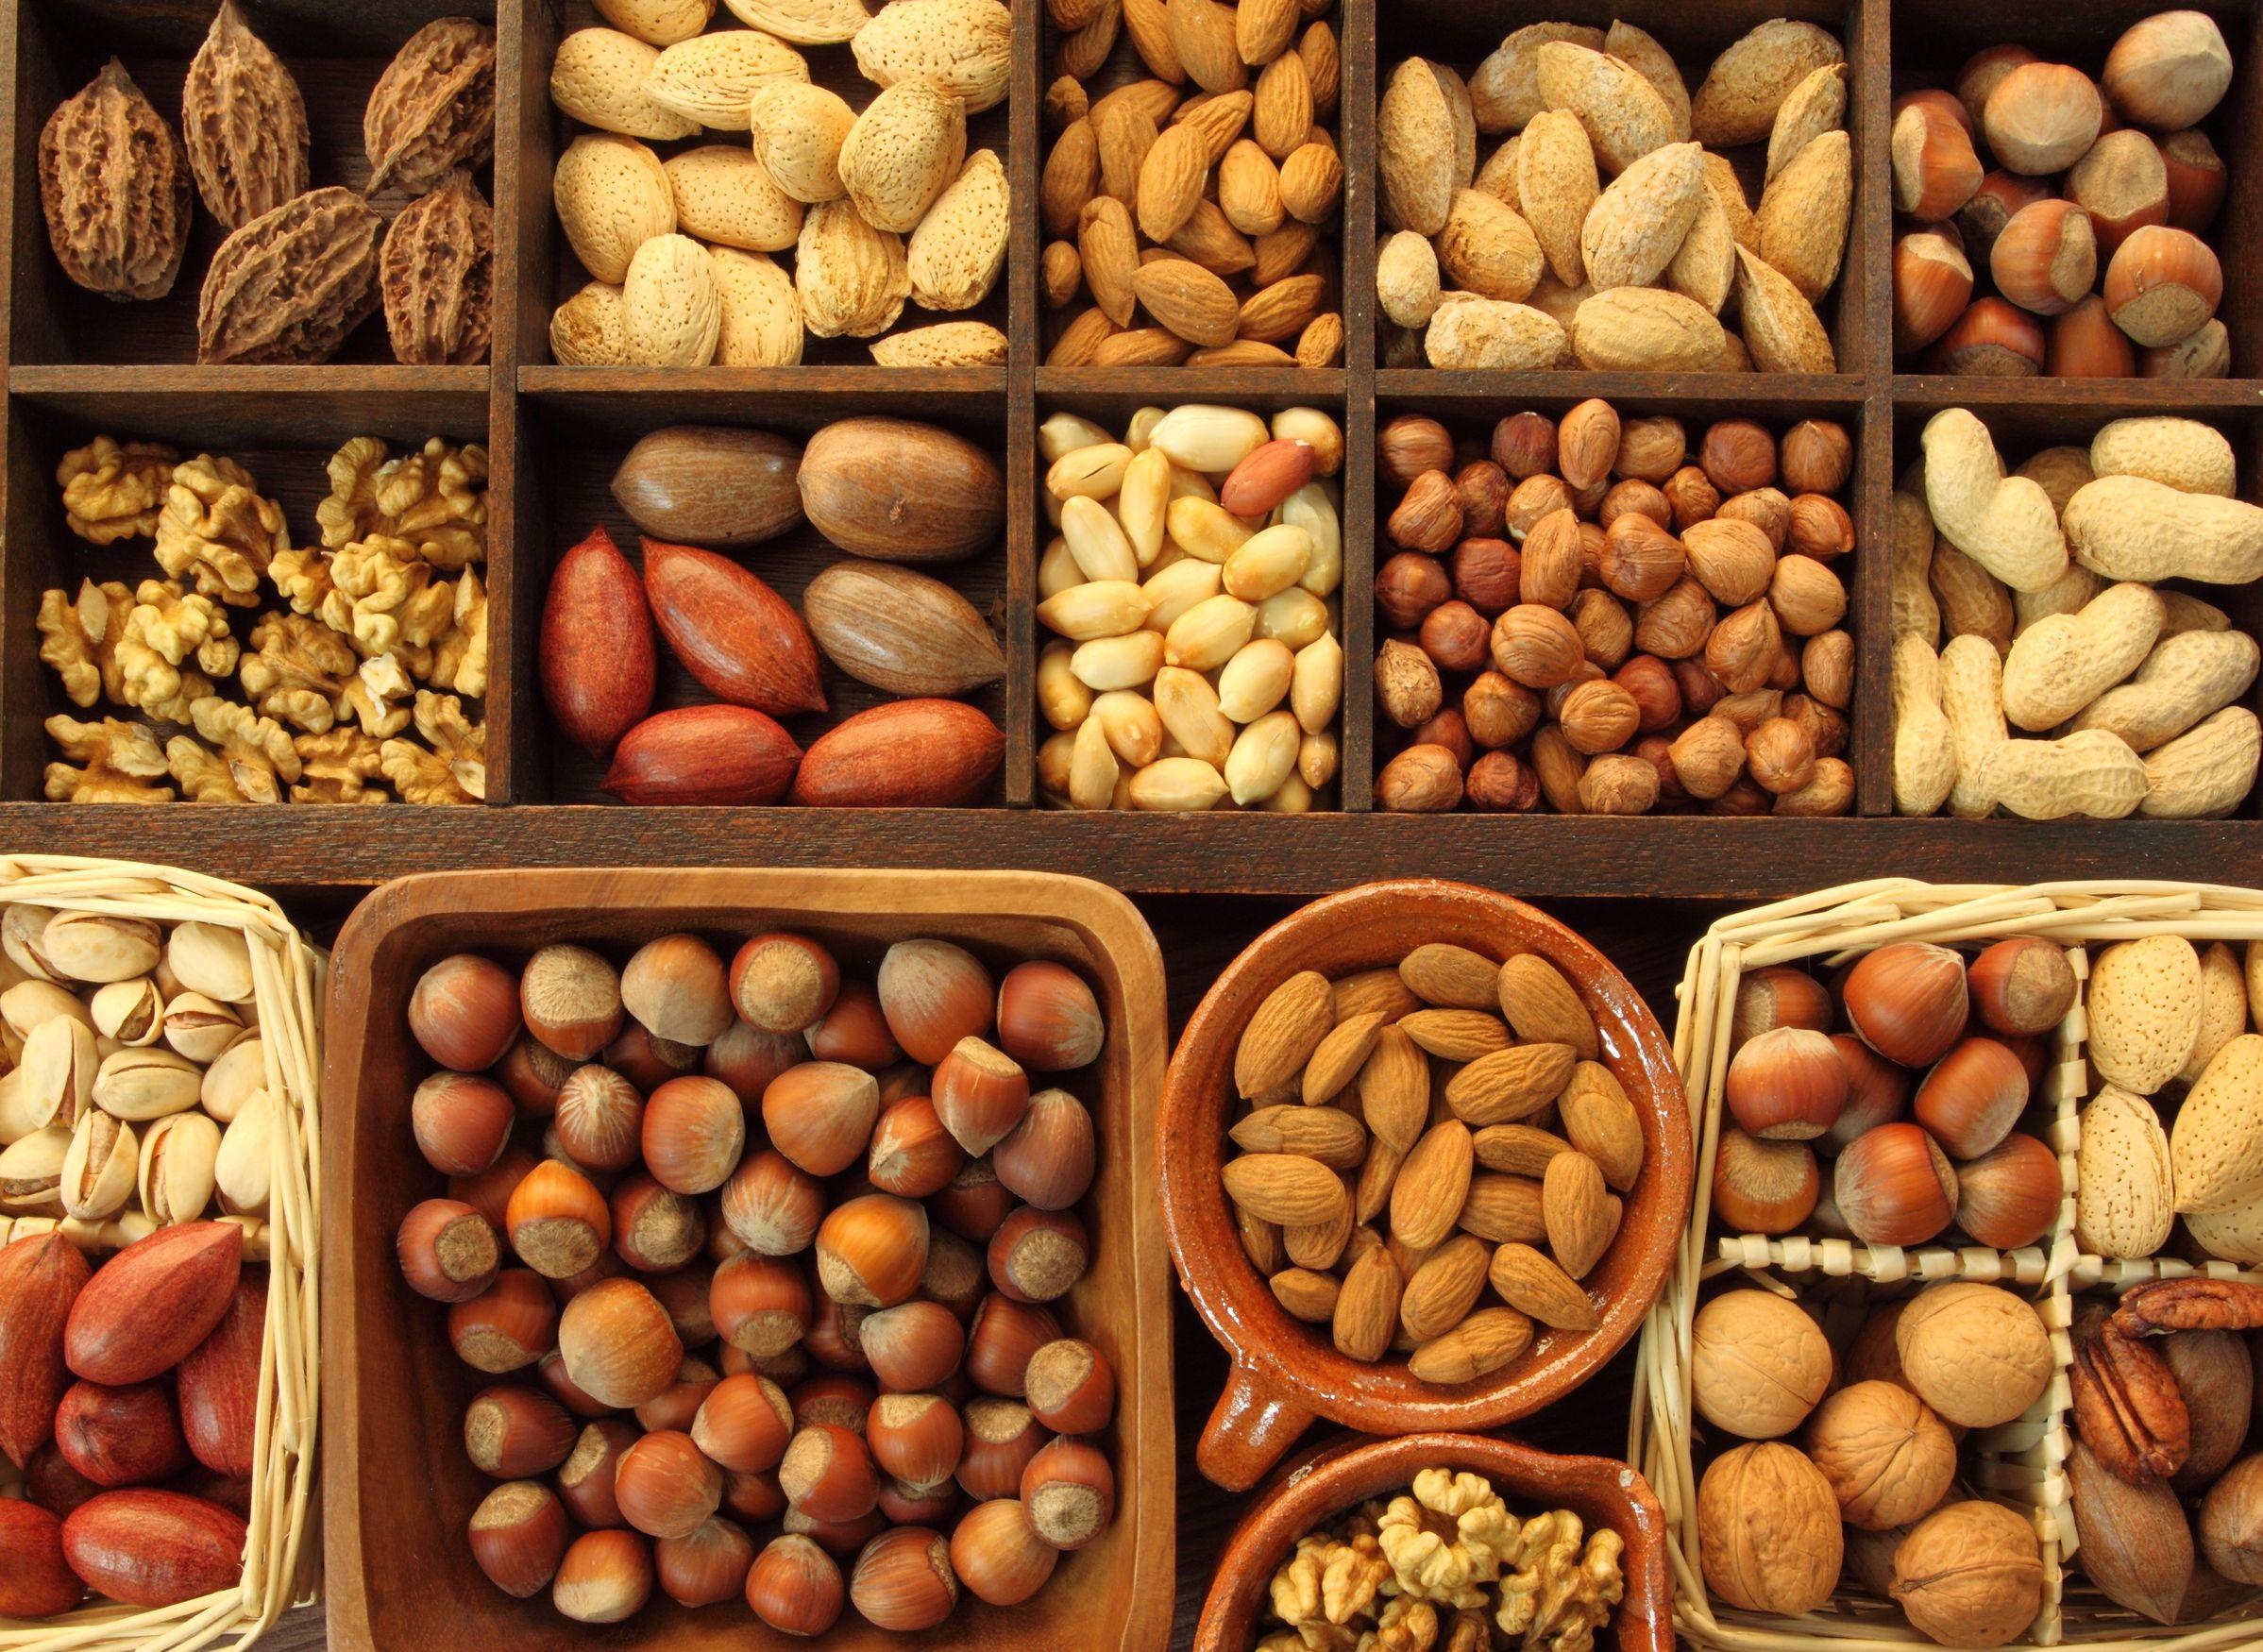 Картинки всех видов орехов